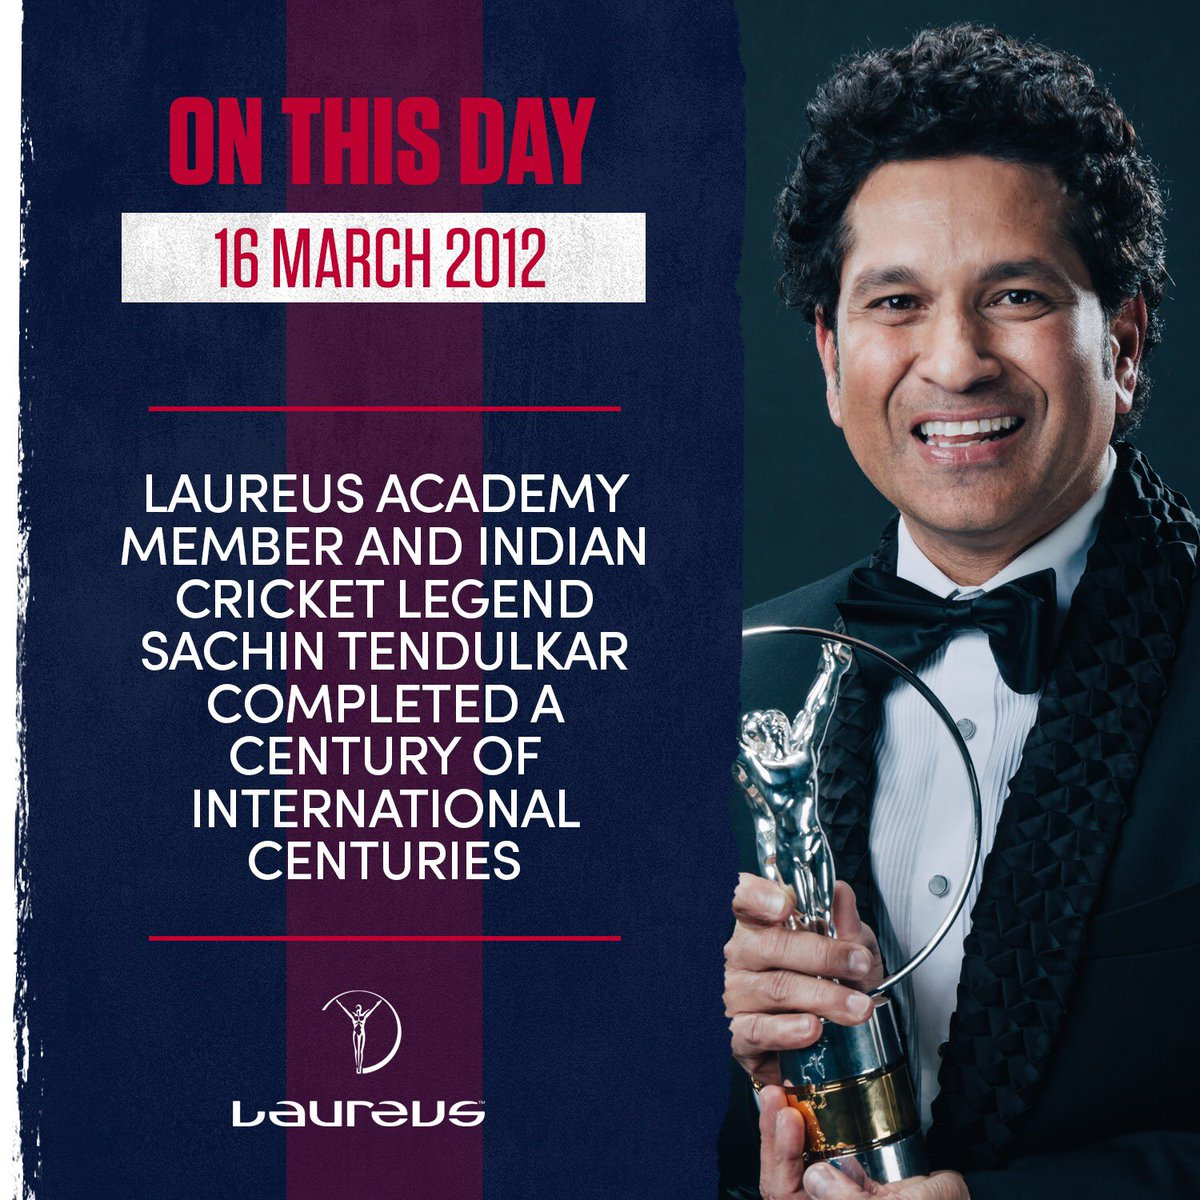 🏏 💯 x 💯 🏏  📅 #OnThisDay in 2012, Laureus Academy member @sachin_rt hit his 100th international century.  Legendary 🔥  #Laureus #SportUnitesUs